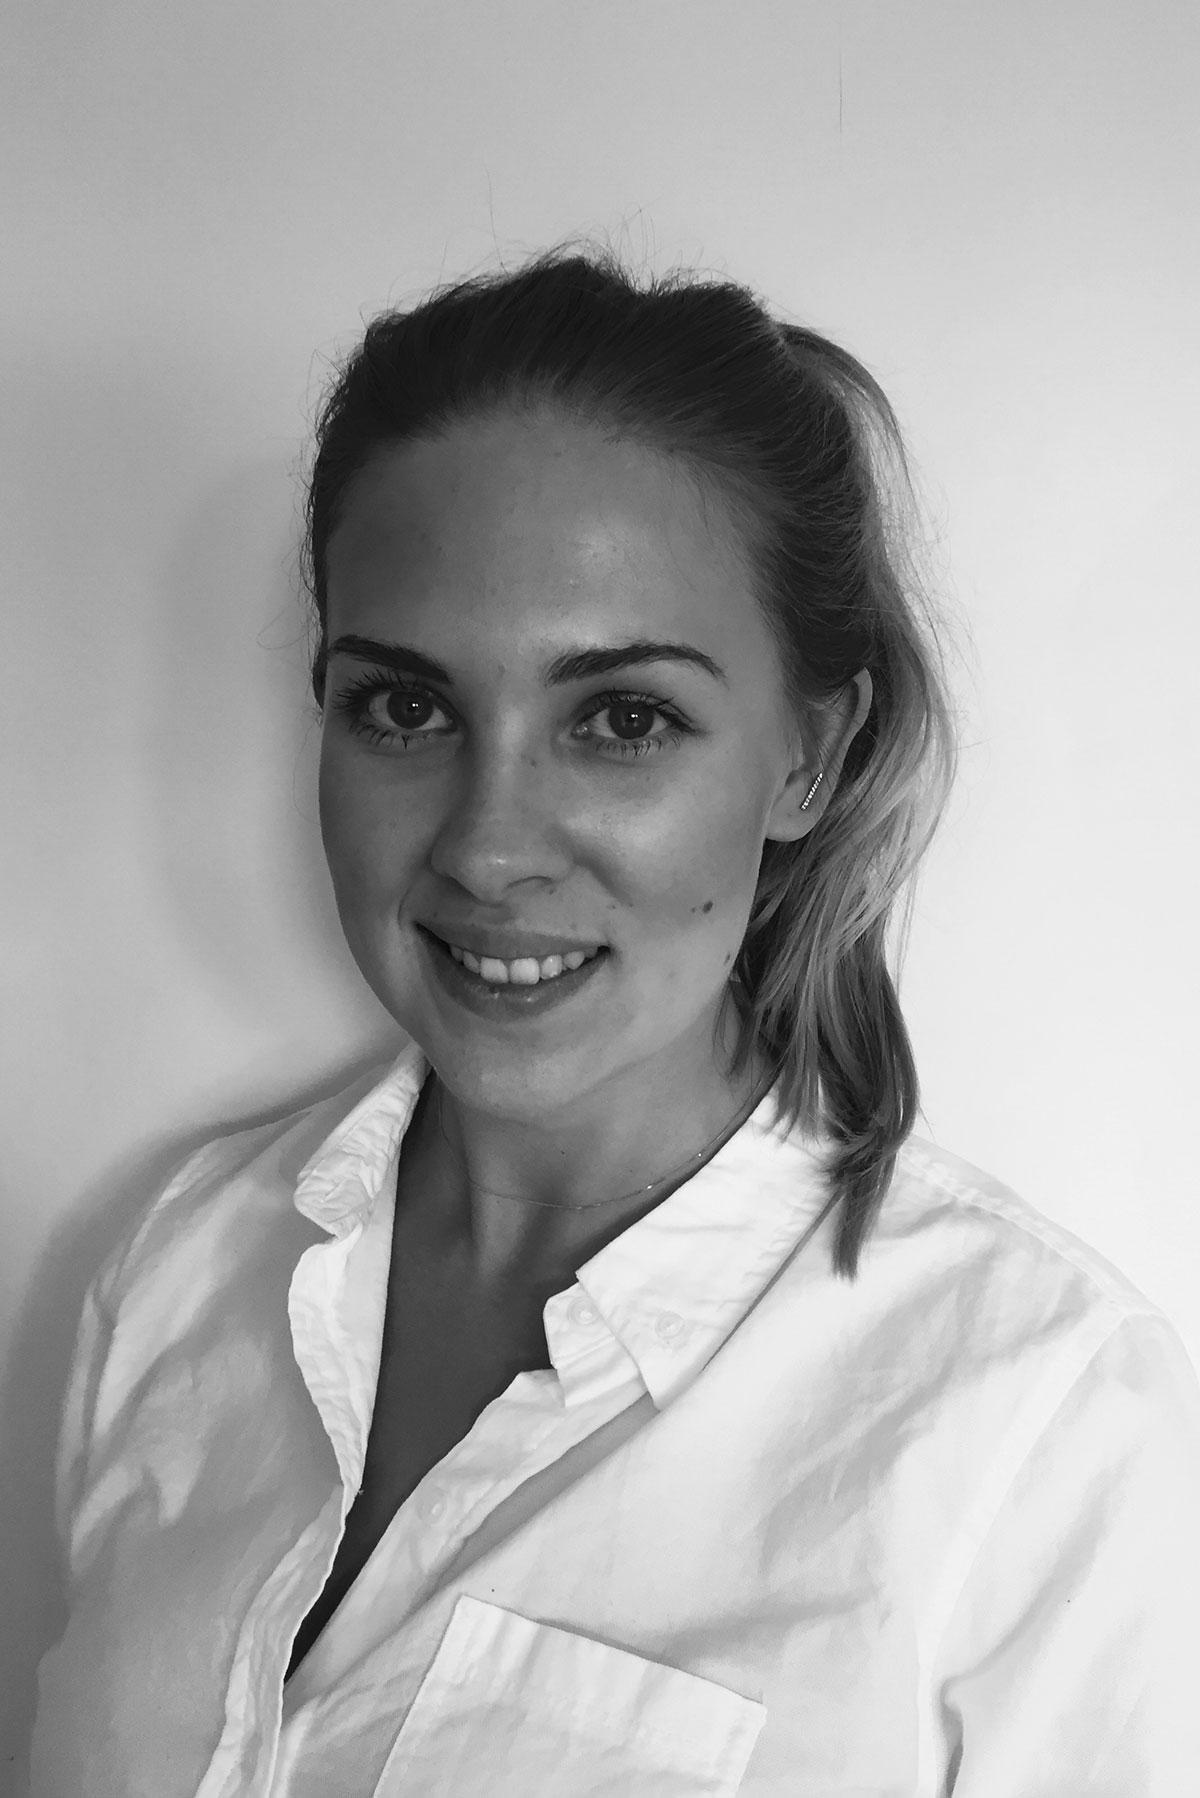 Kathryn Snudden